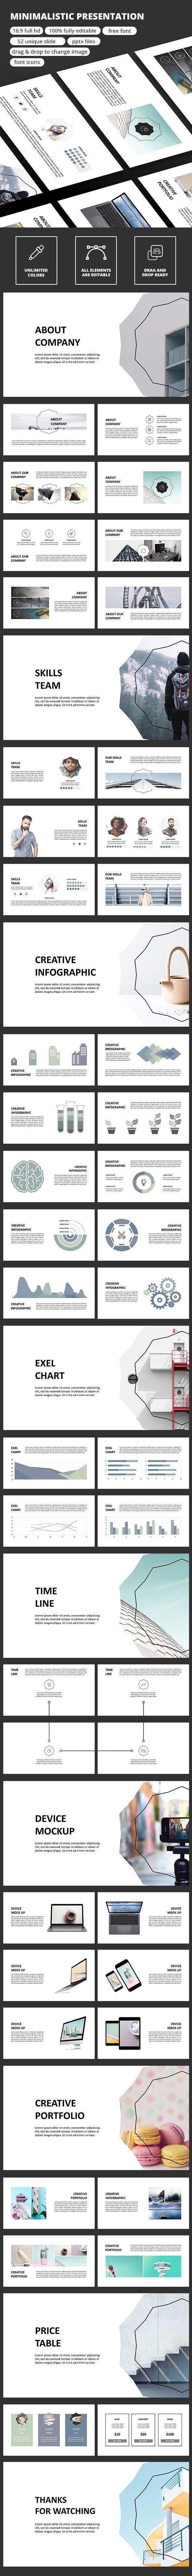 Minimalistic - PowerPoint Presentation Template